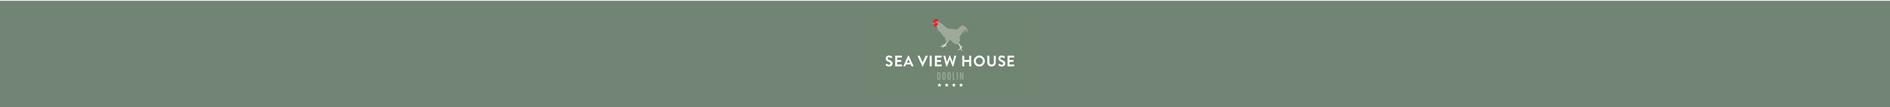 Sea View House Doolin